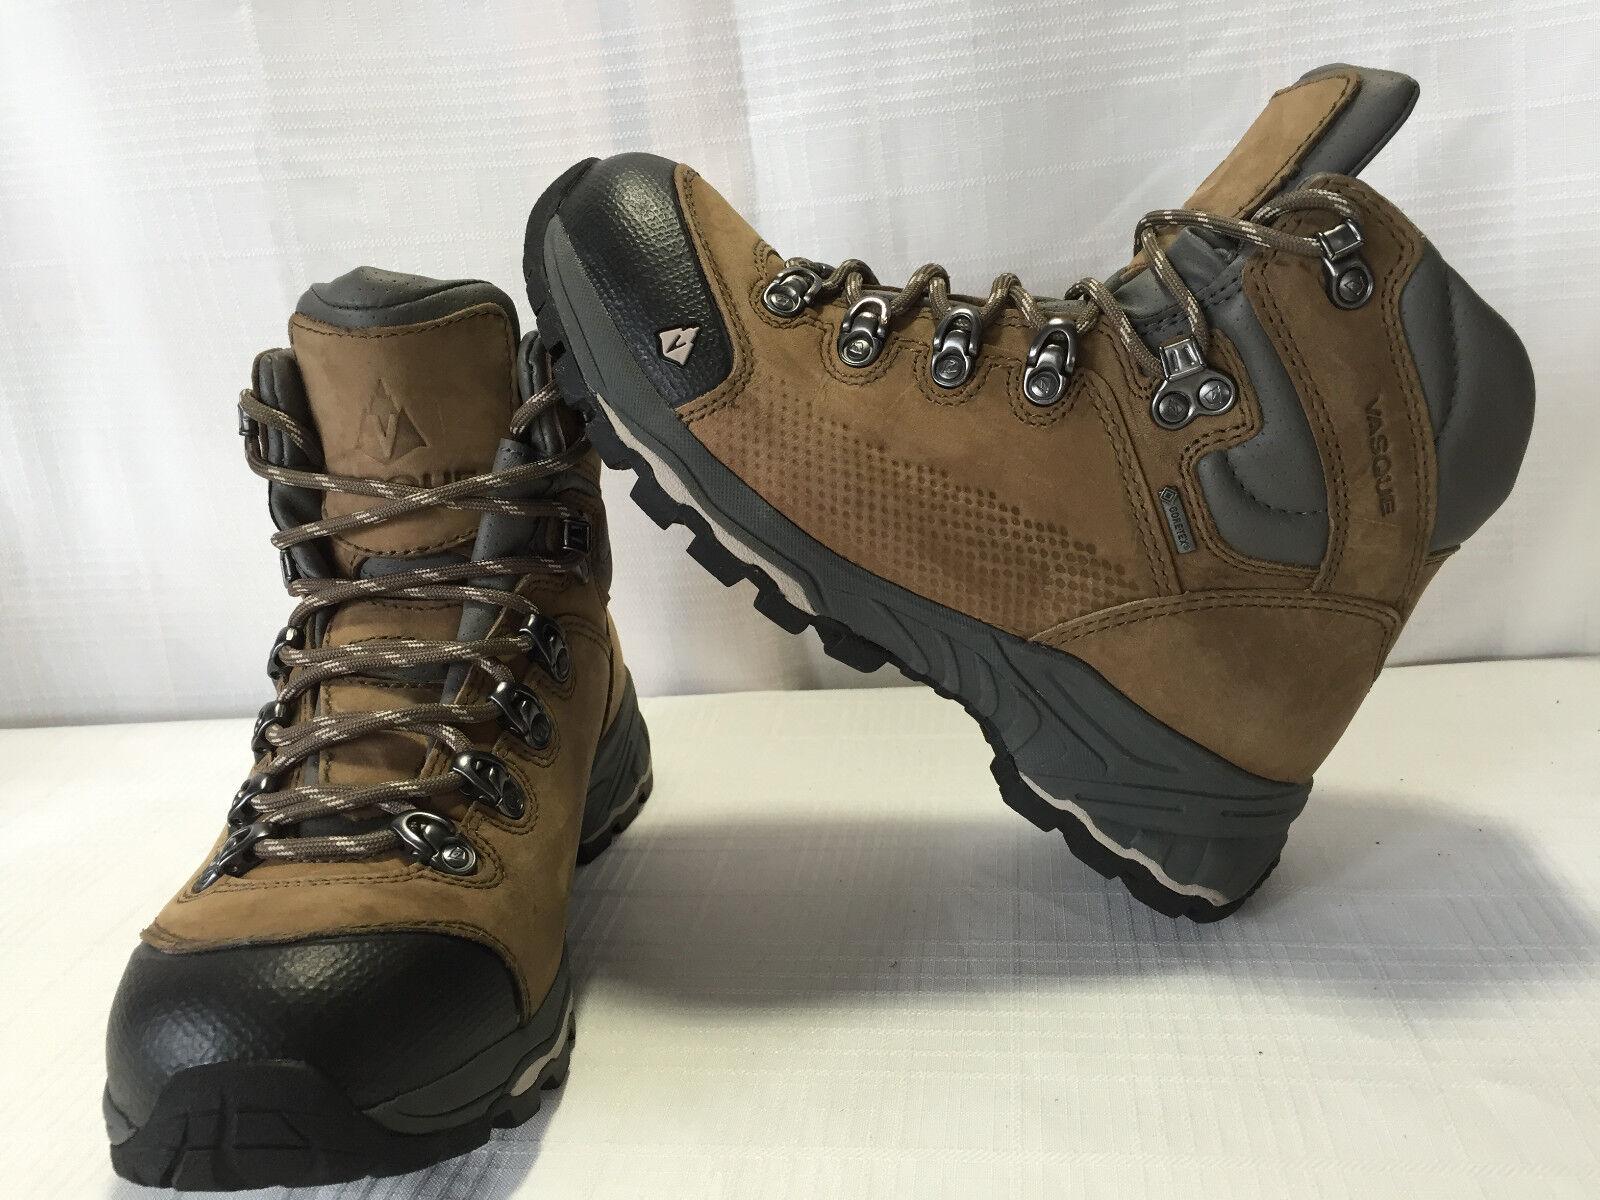 VASQUE ST ELIAS GTX Hiking Stiefel Damens Größe US 7.5M EU 38 Braun Leder 250